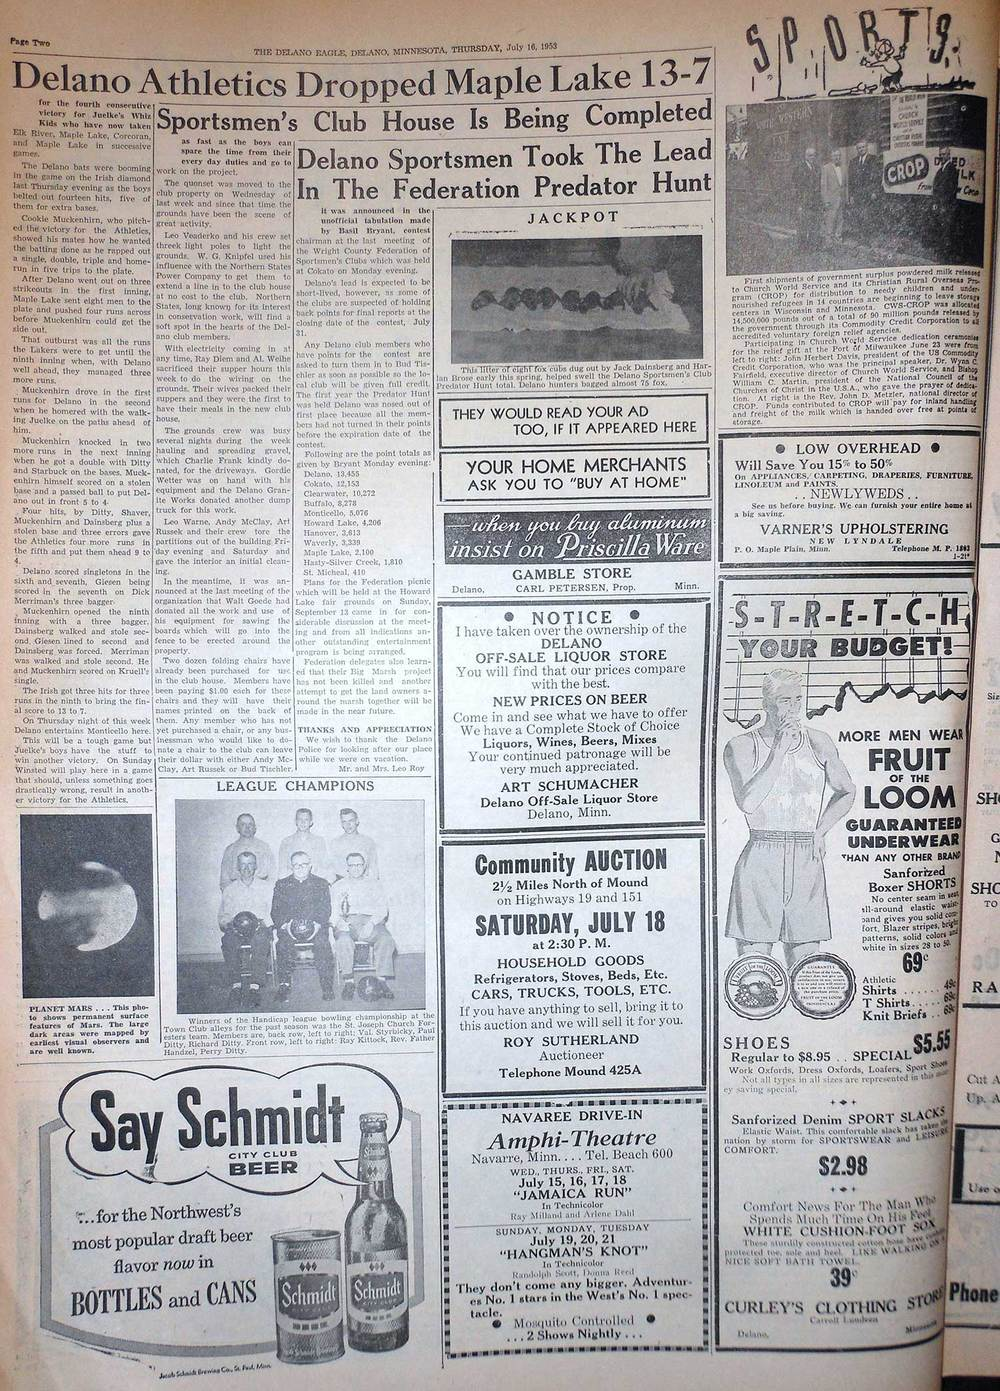 7/16/1953, p2